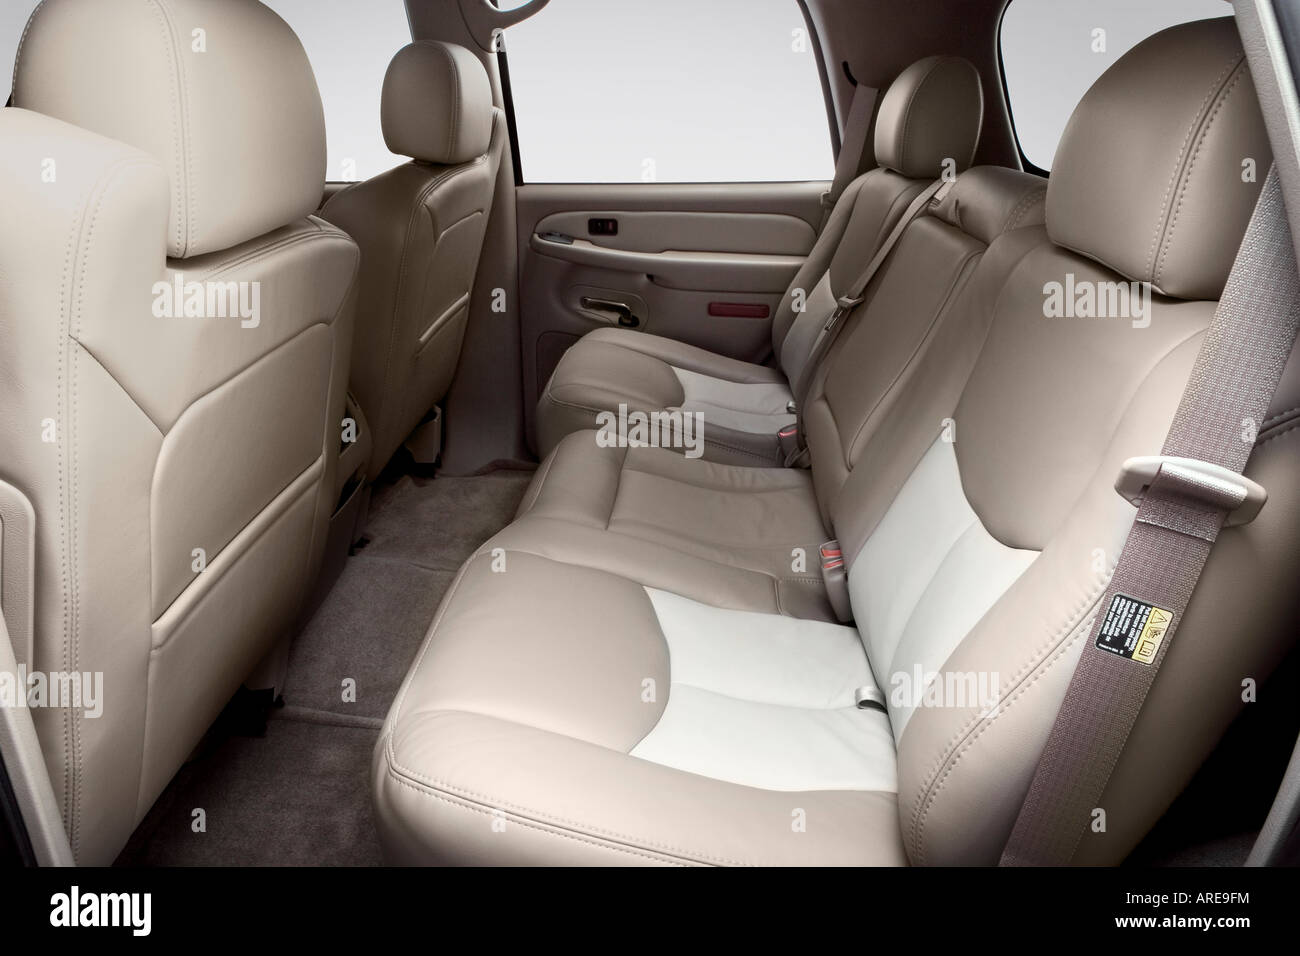 hight resolution of 2006 gmc yukon denali in black rear seats